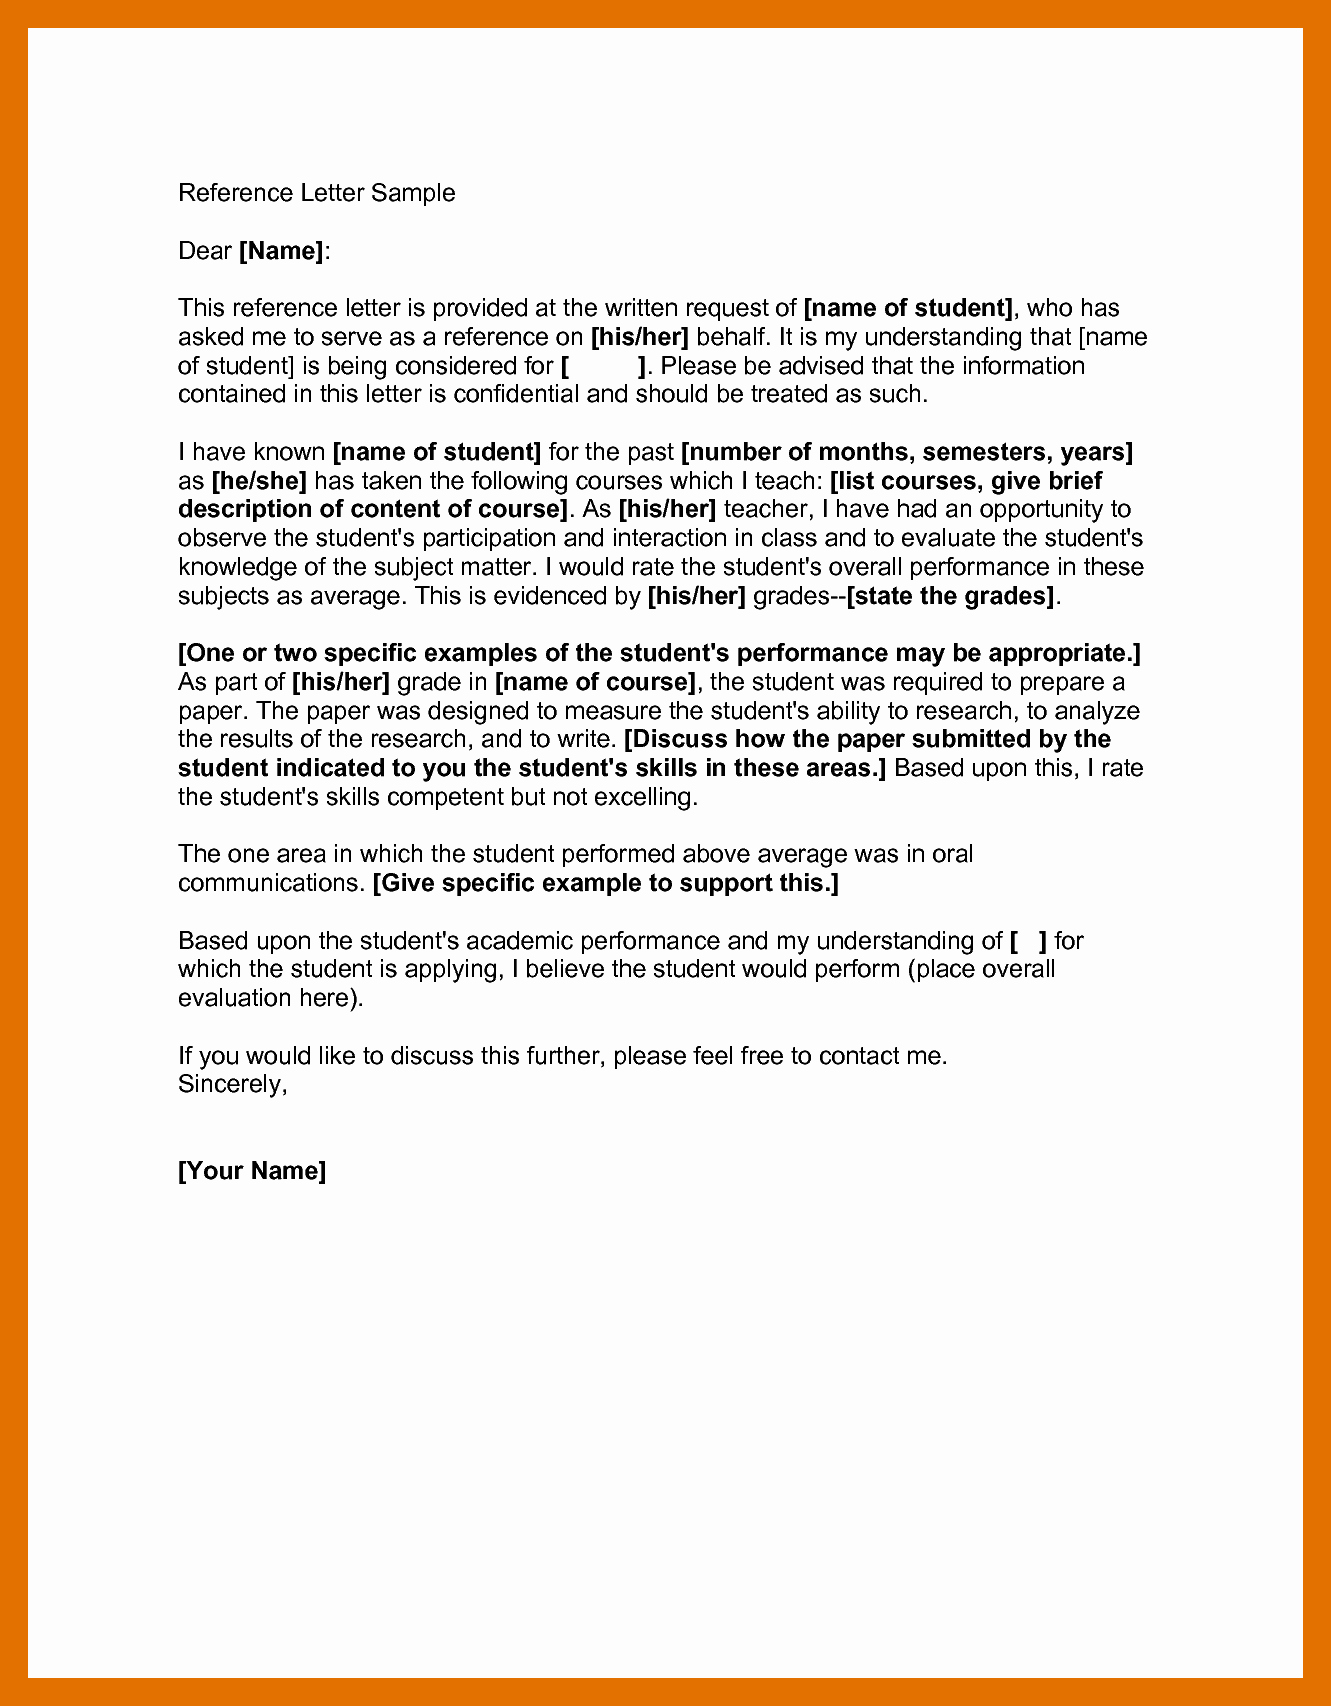 Adoption Recommendation Letter Sample Inspirational 3 4 Letter Of Re Mendation for Adoption